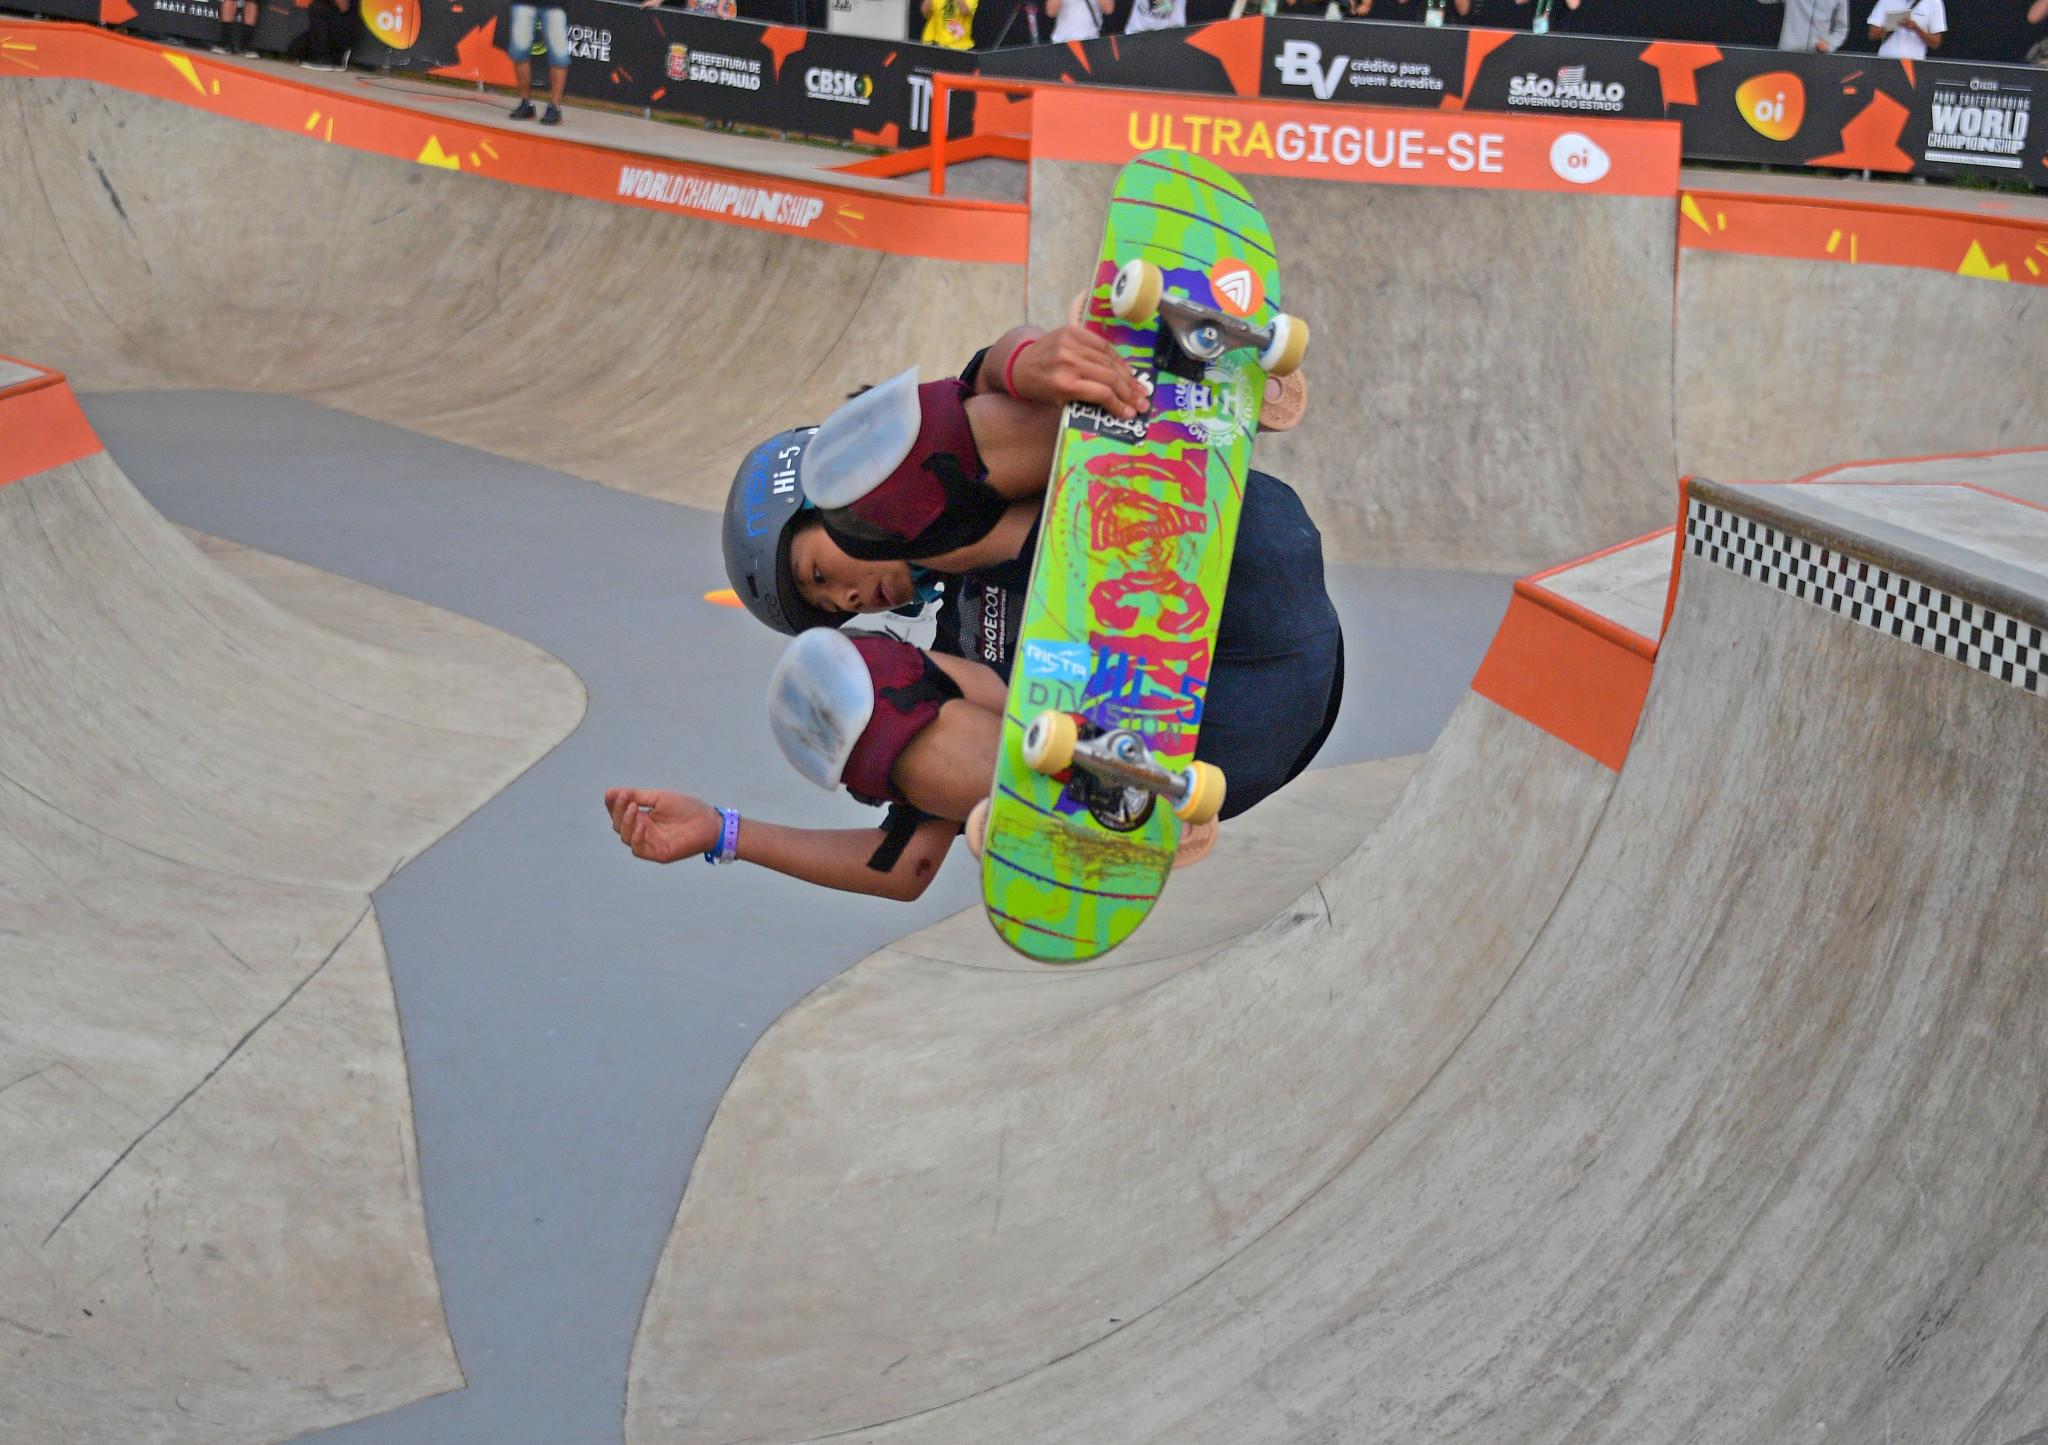 Misugu Okamoto starred again in Rio de Janeiro ©Getty Images